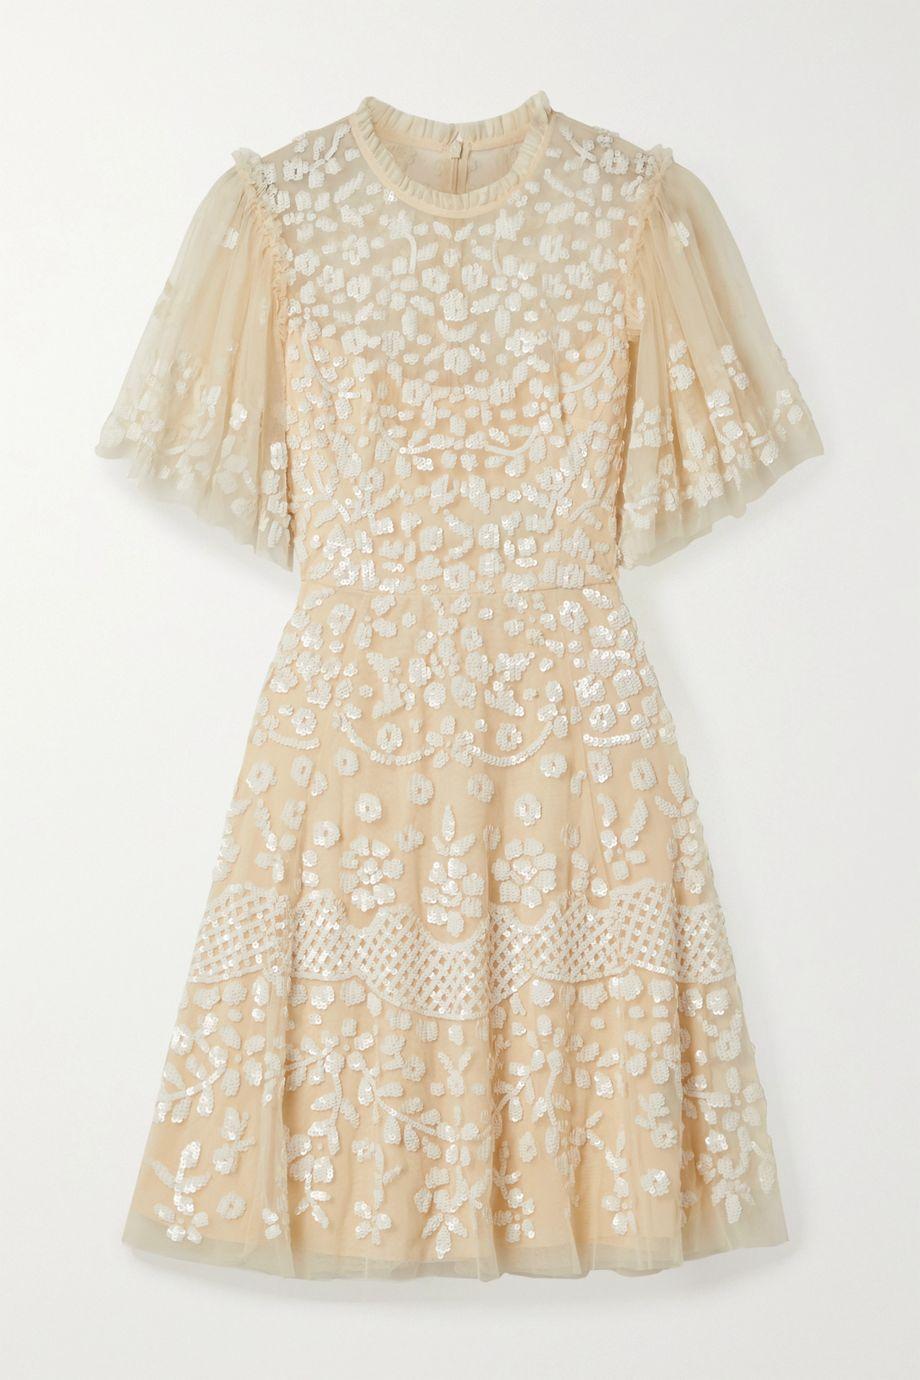 Needle & Thread Honesty Flower sequined tulle mini dress